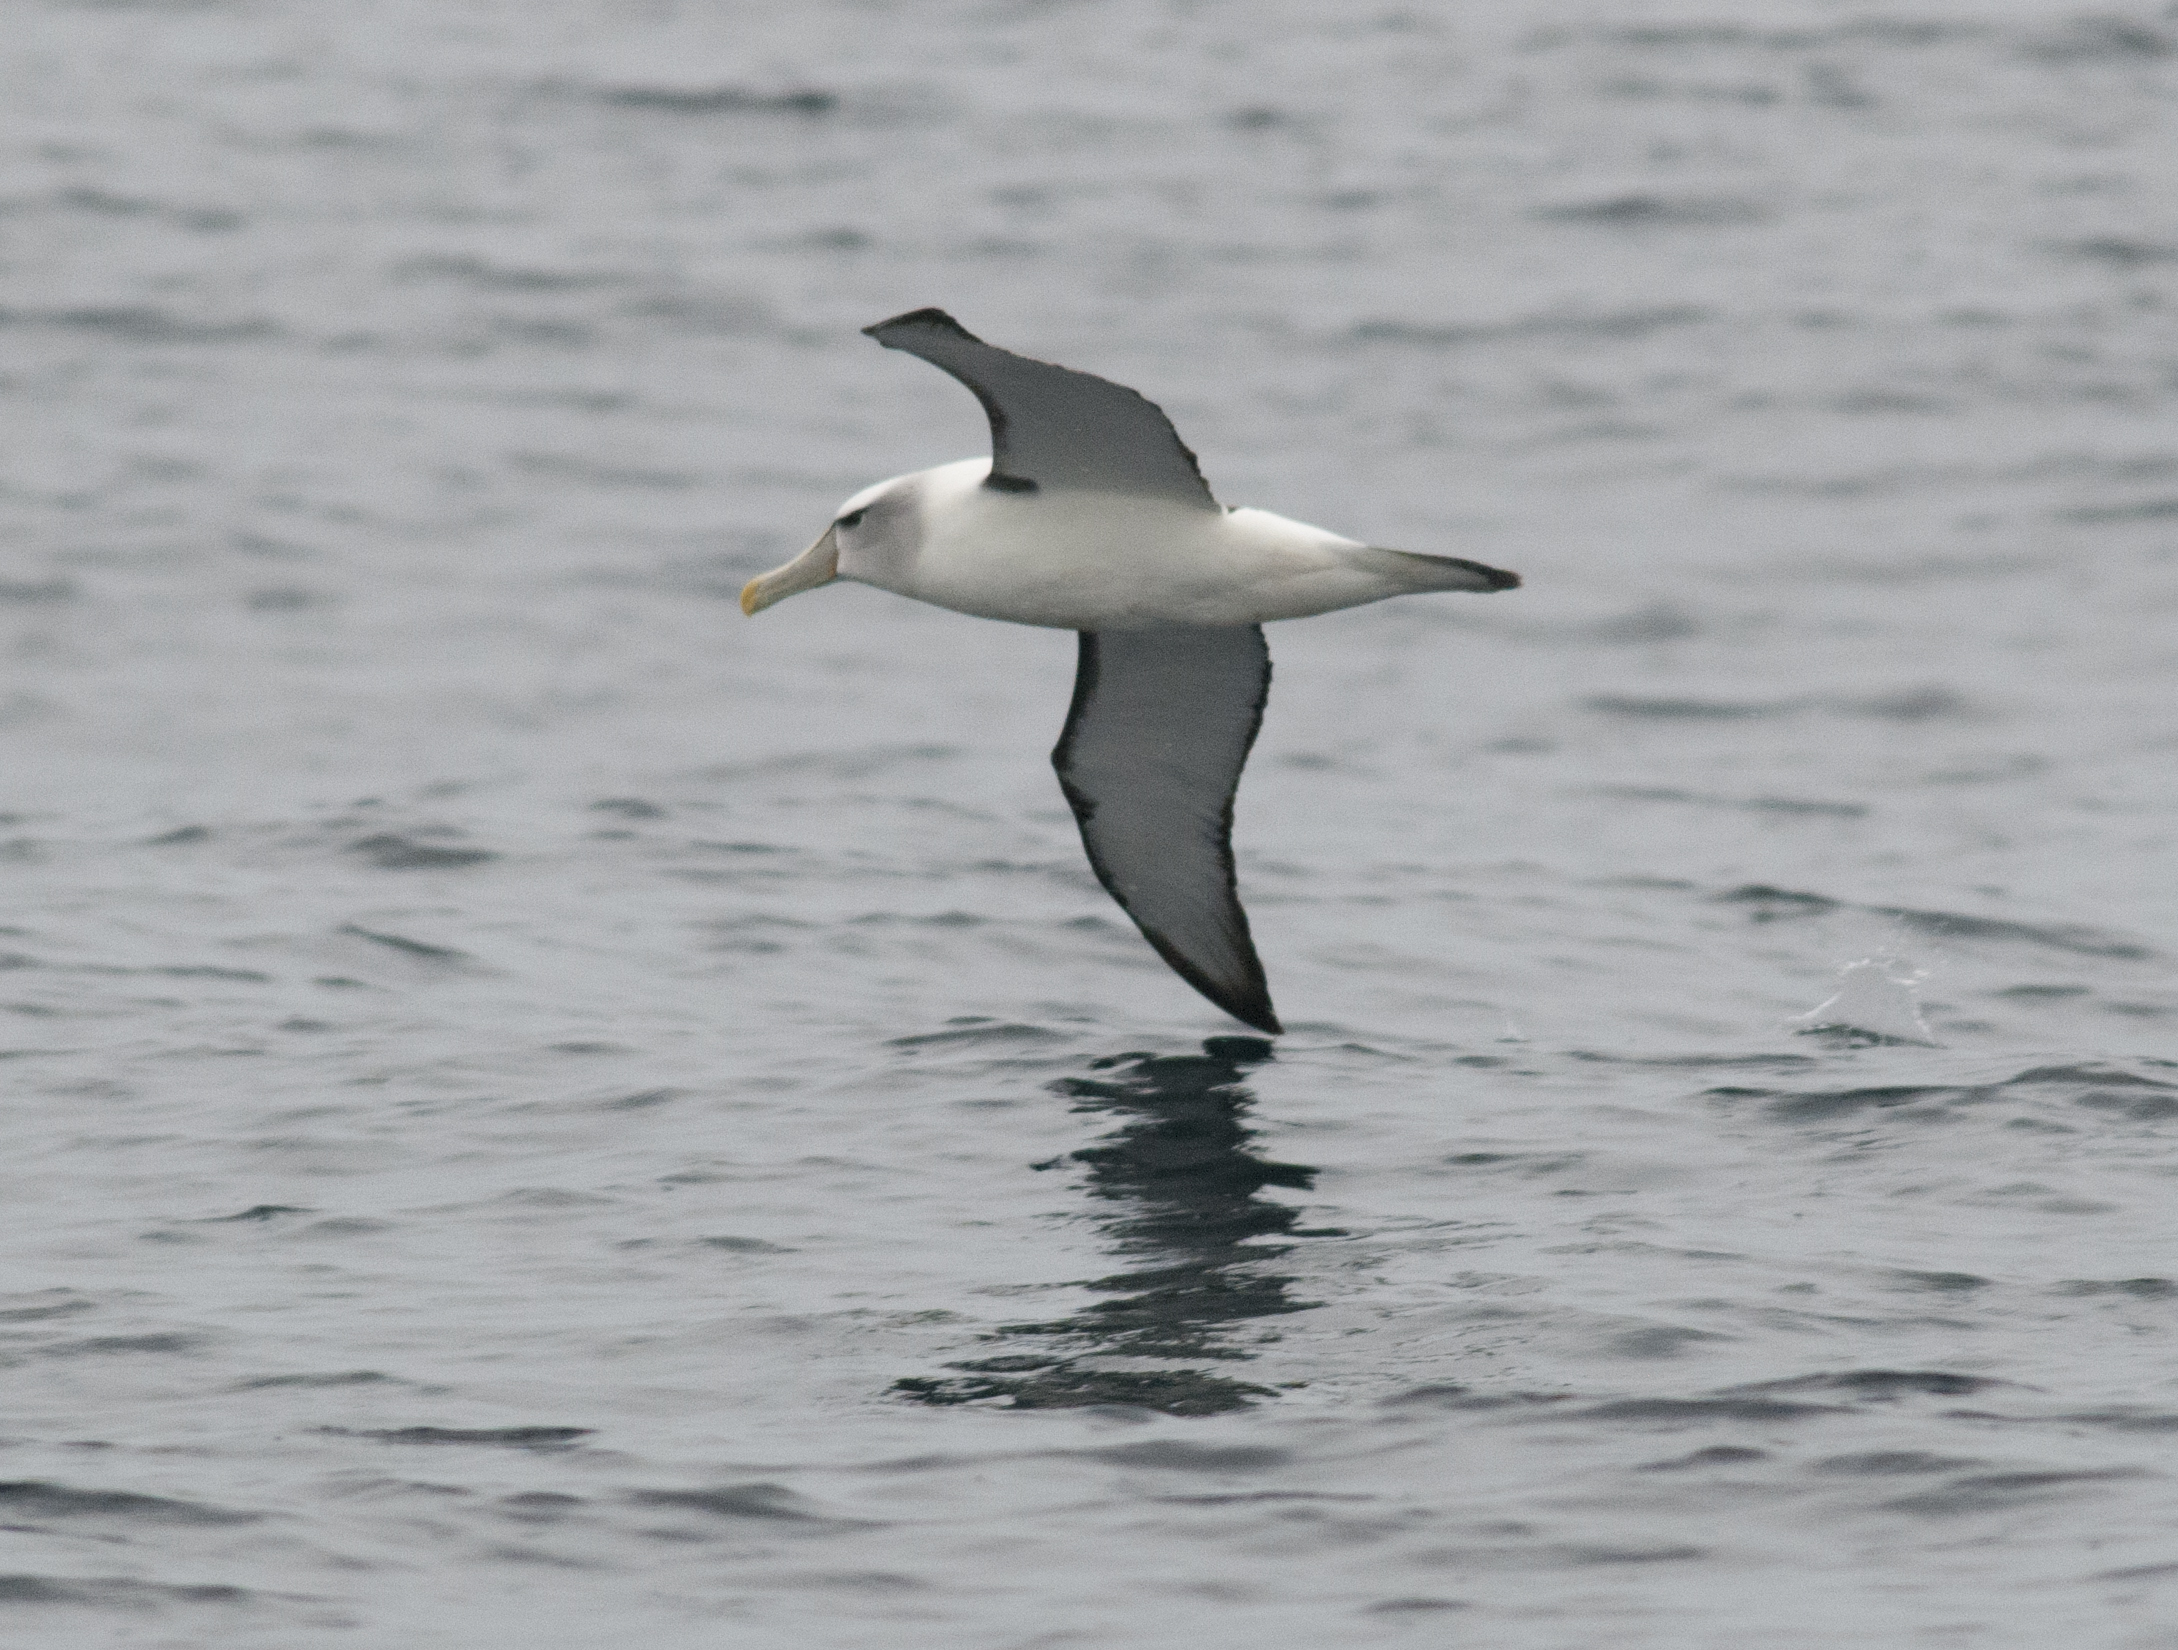 shy albatross thalassarche cauta tasman national park tasmania